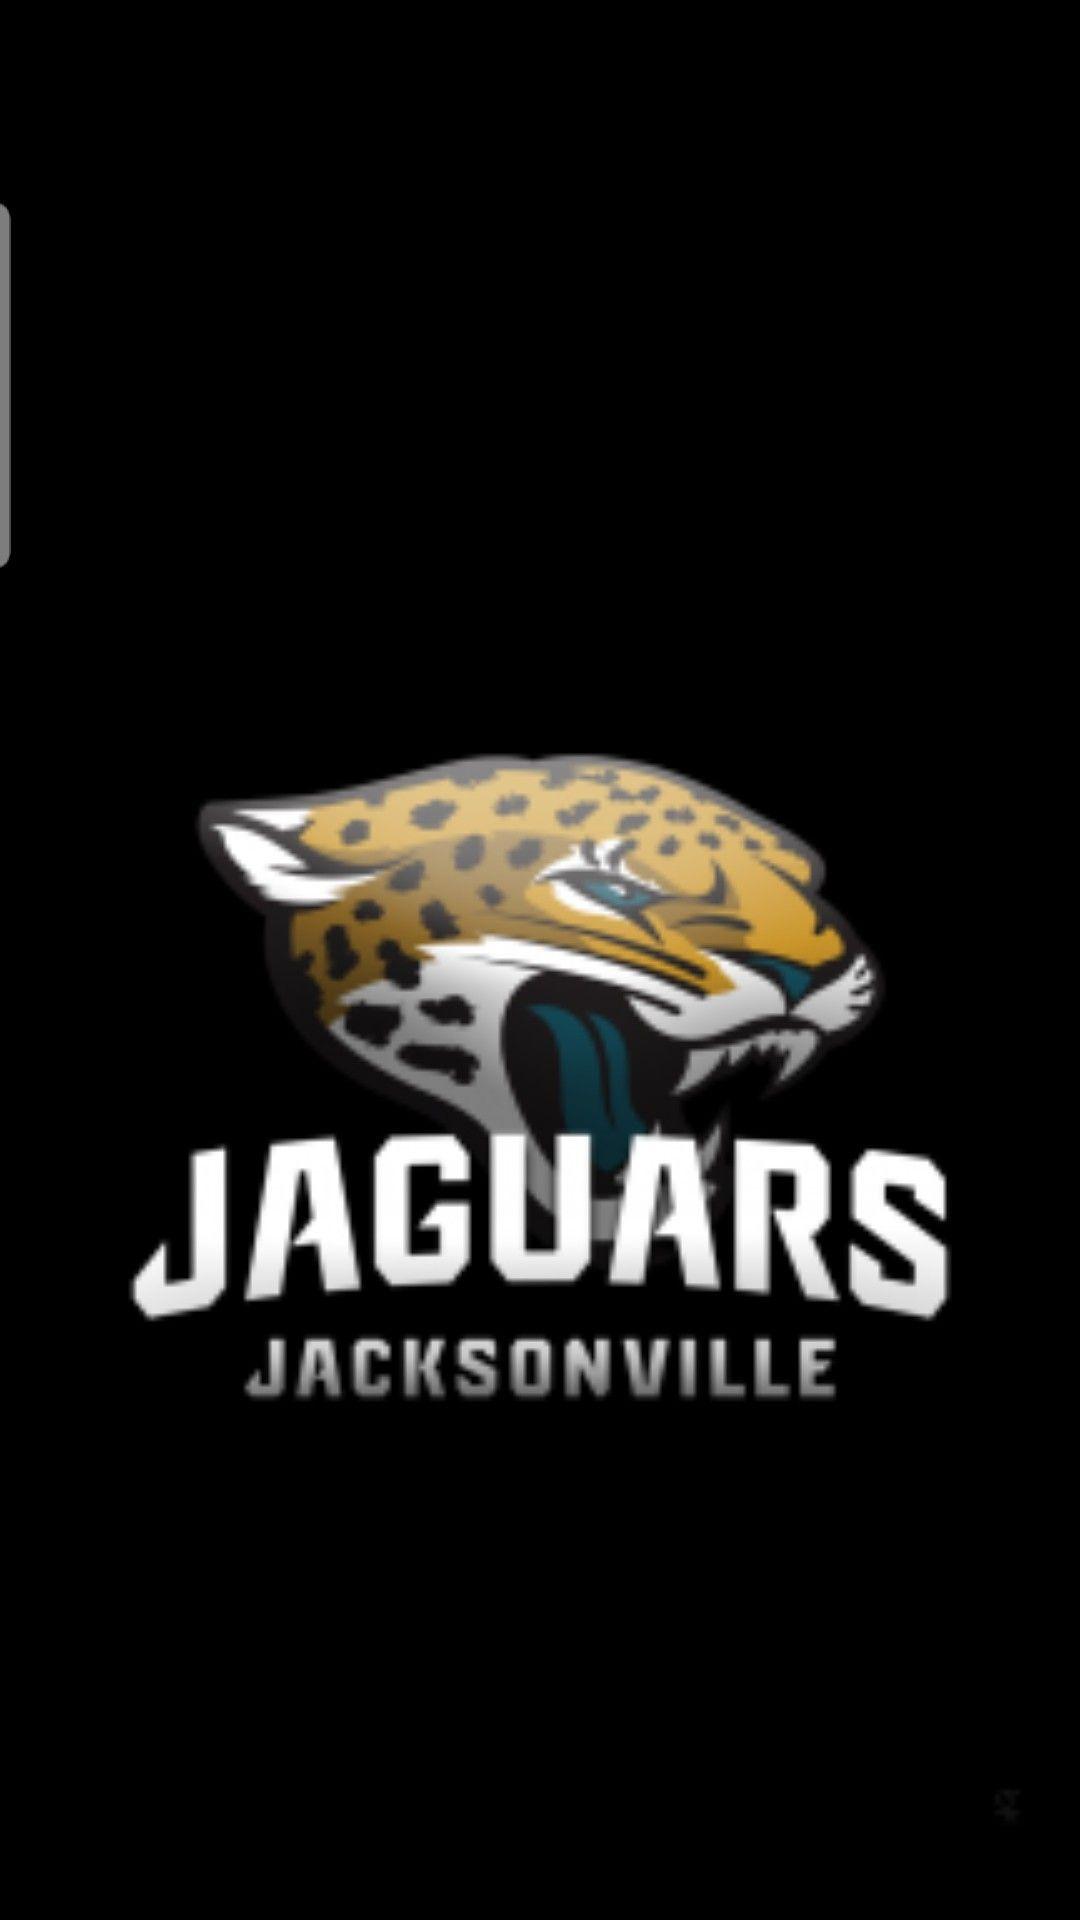 Pin By Archie Douglas On Sportz Wallpaperz Sports Team Logos Jaguars Jacksonville Jaguars